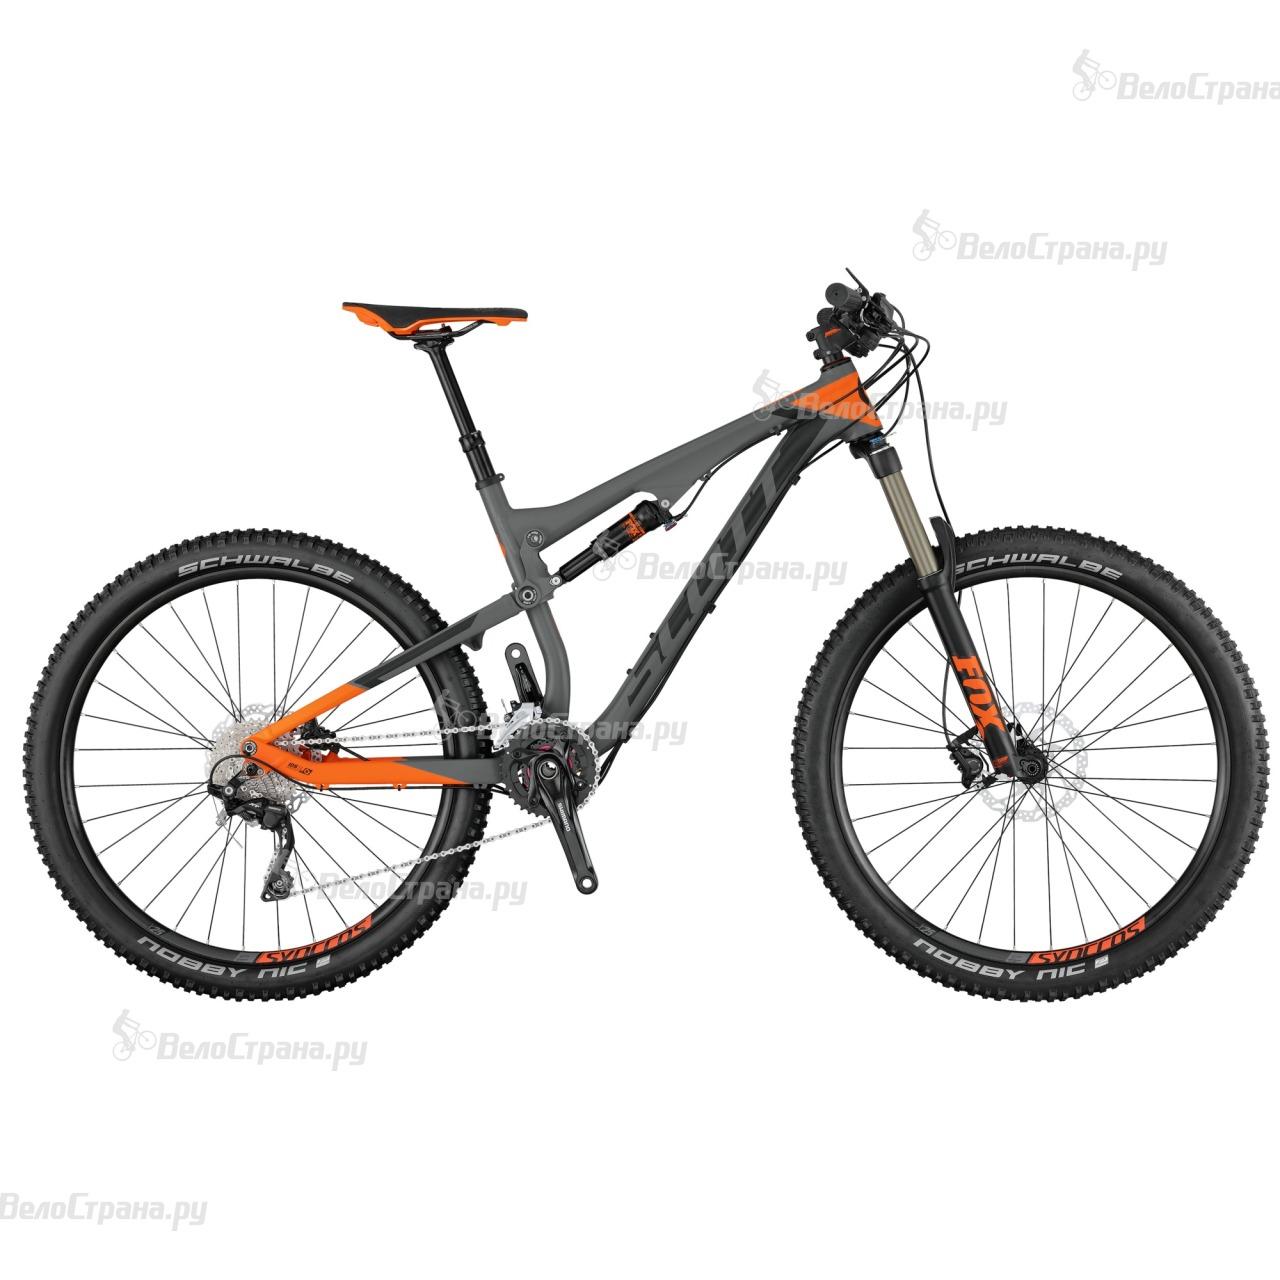 Велосипед Scott Genius 740 (2017) велосипед scott genius lt 700 tuned plus 2016